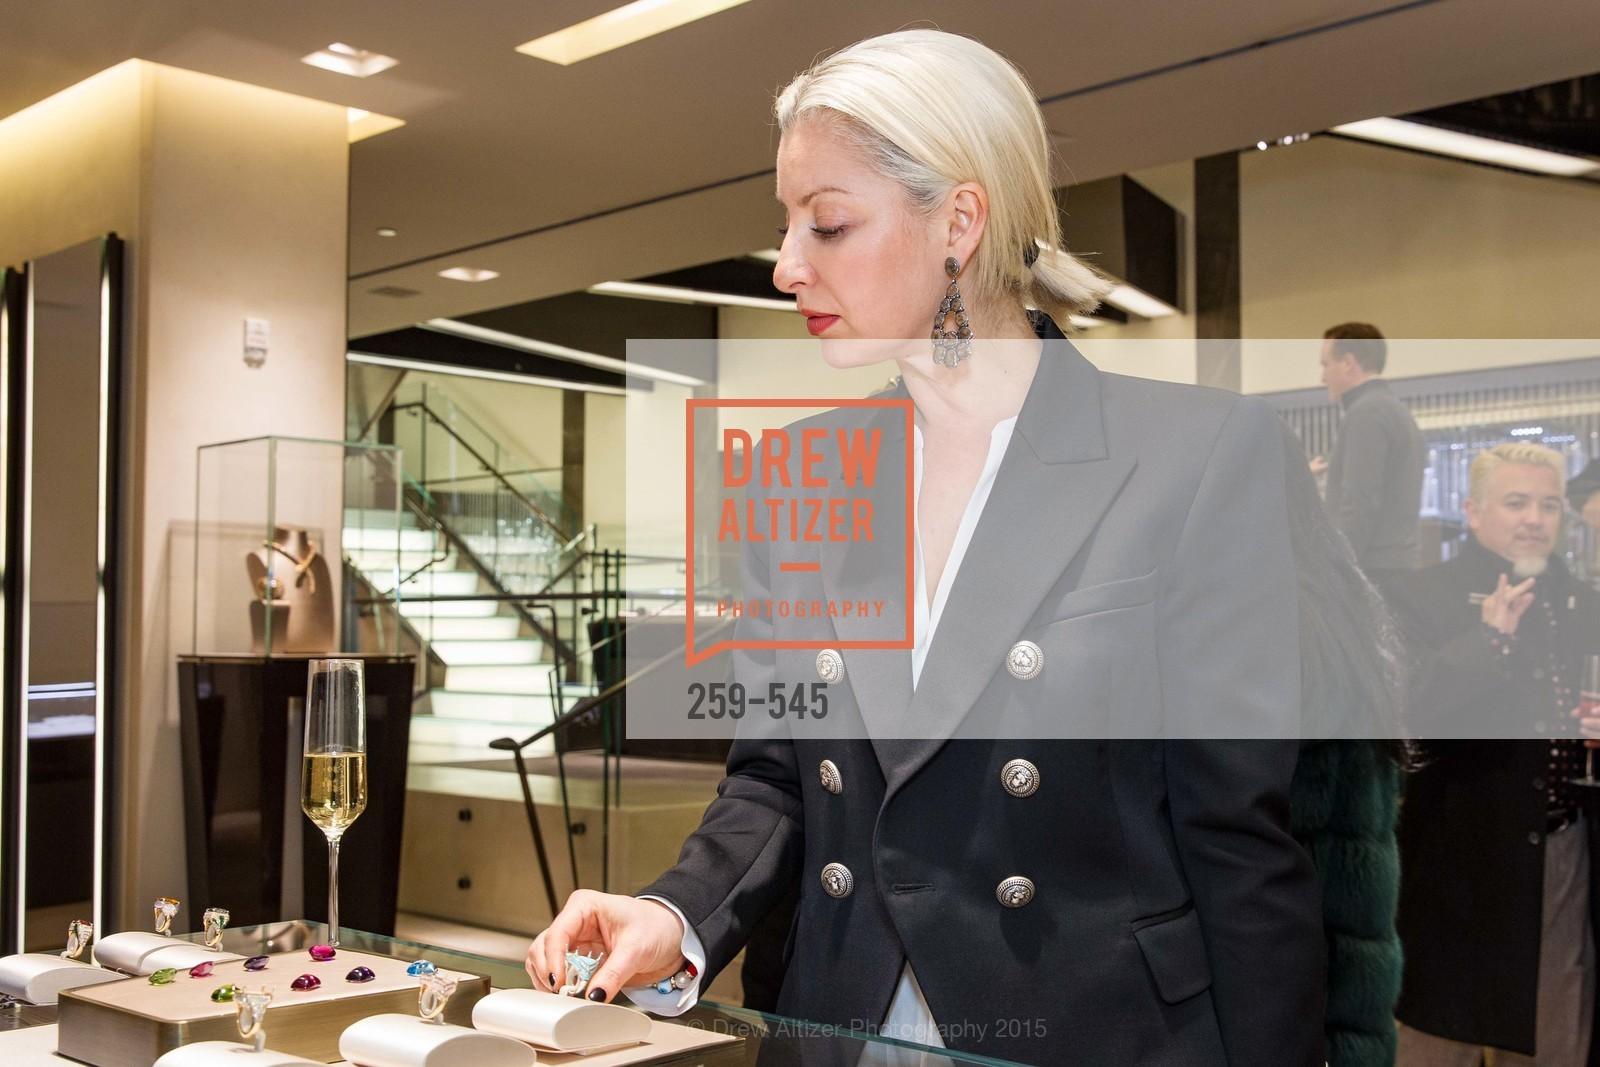 Sonya Molodetskaya, Bulgari Presents B.Cocktail, Bulgari. 200 Stockton Street, November 17th, 2015,Drew Altizer, Drew Altizer Photography, full-service agency, private events, San Francisco photographer, photographer california